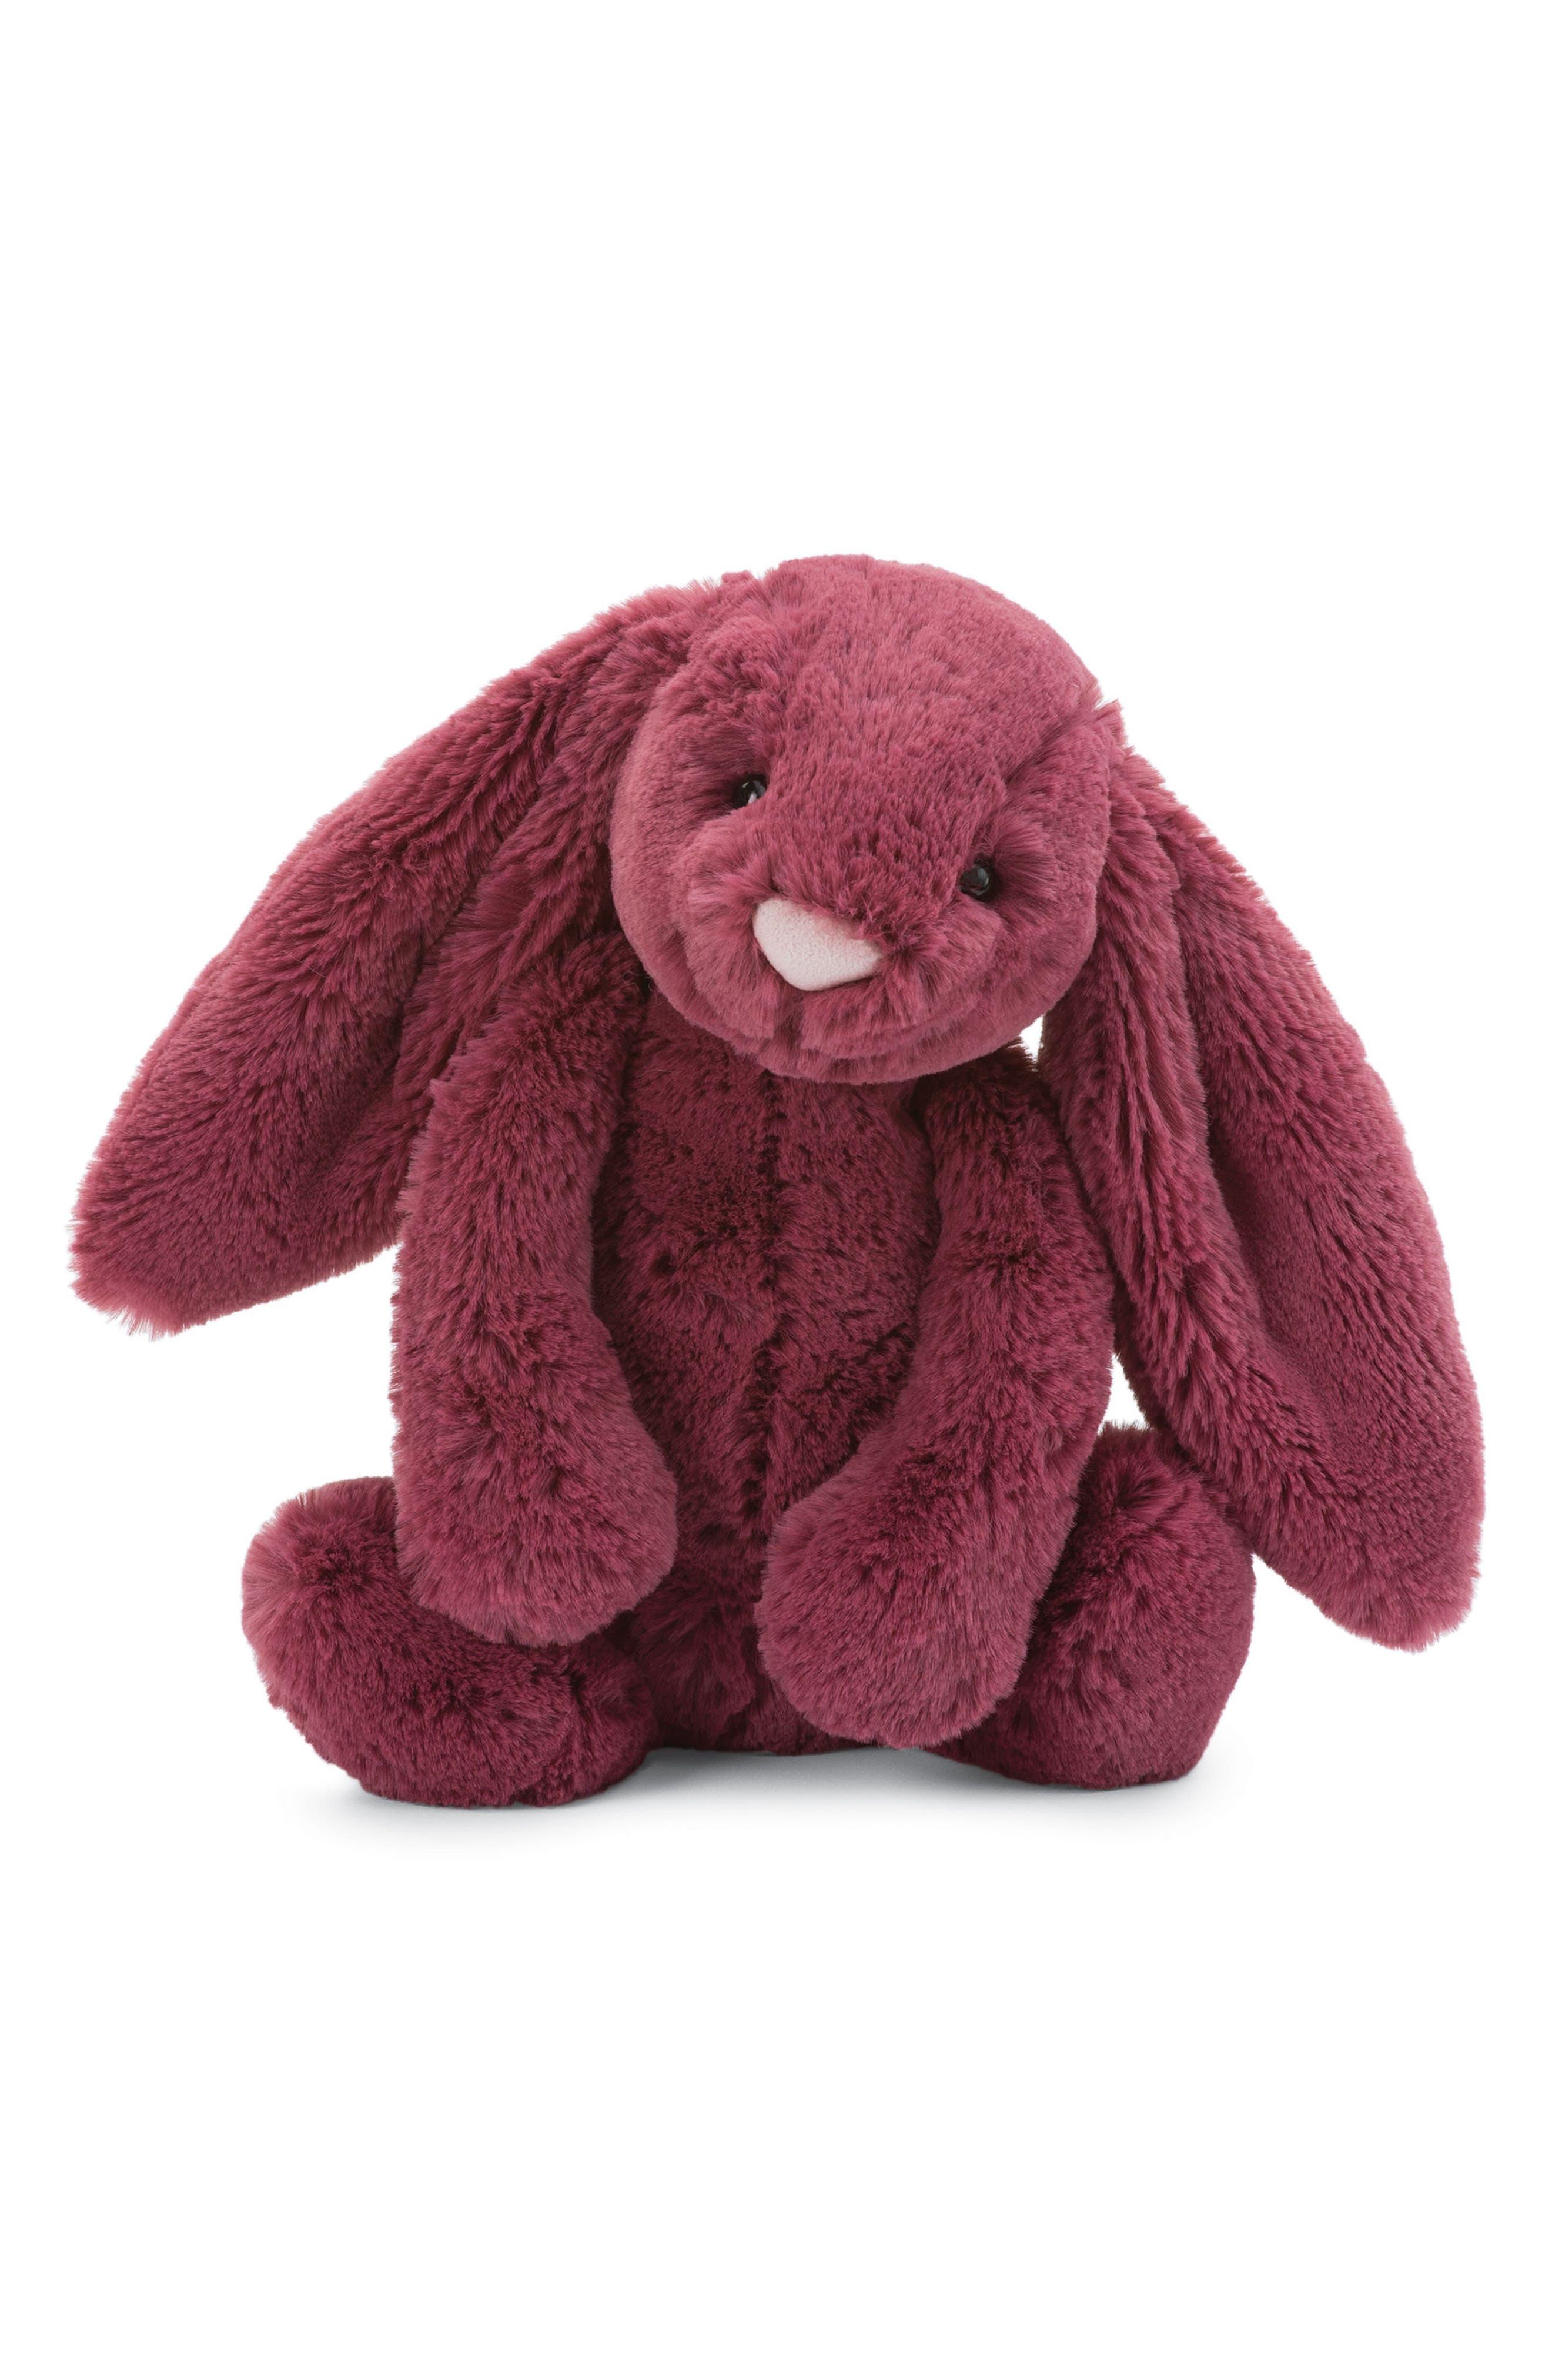 Jellycat Bashful Berry Bunny Stuffed Animal